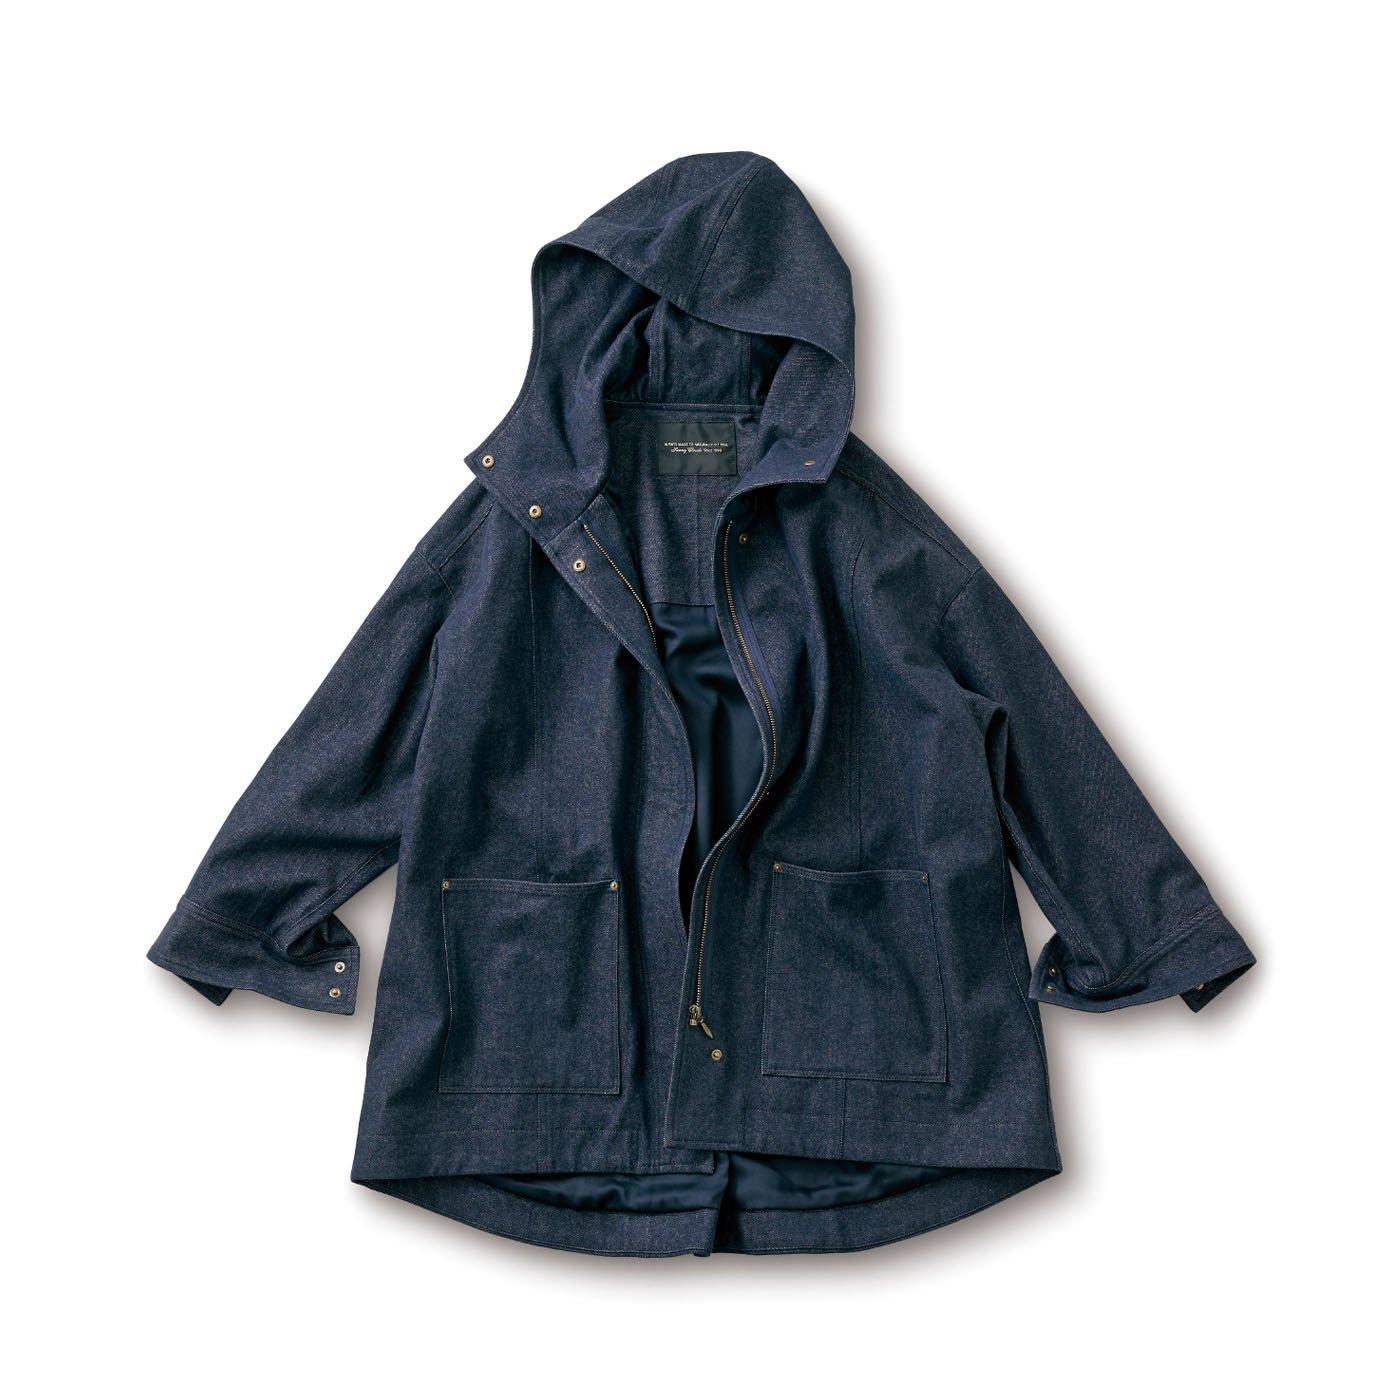 SUNNY CLOUDS デニム風味のハーフコート〈レディース〉